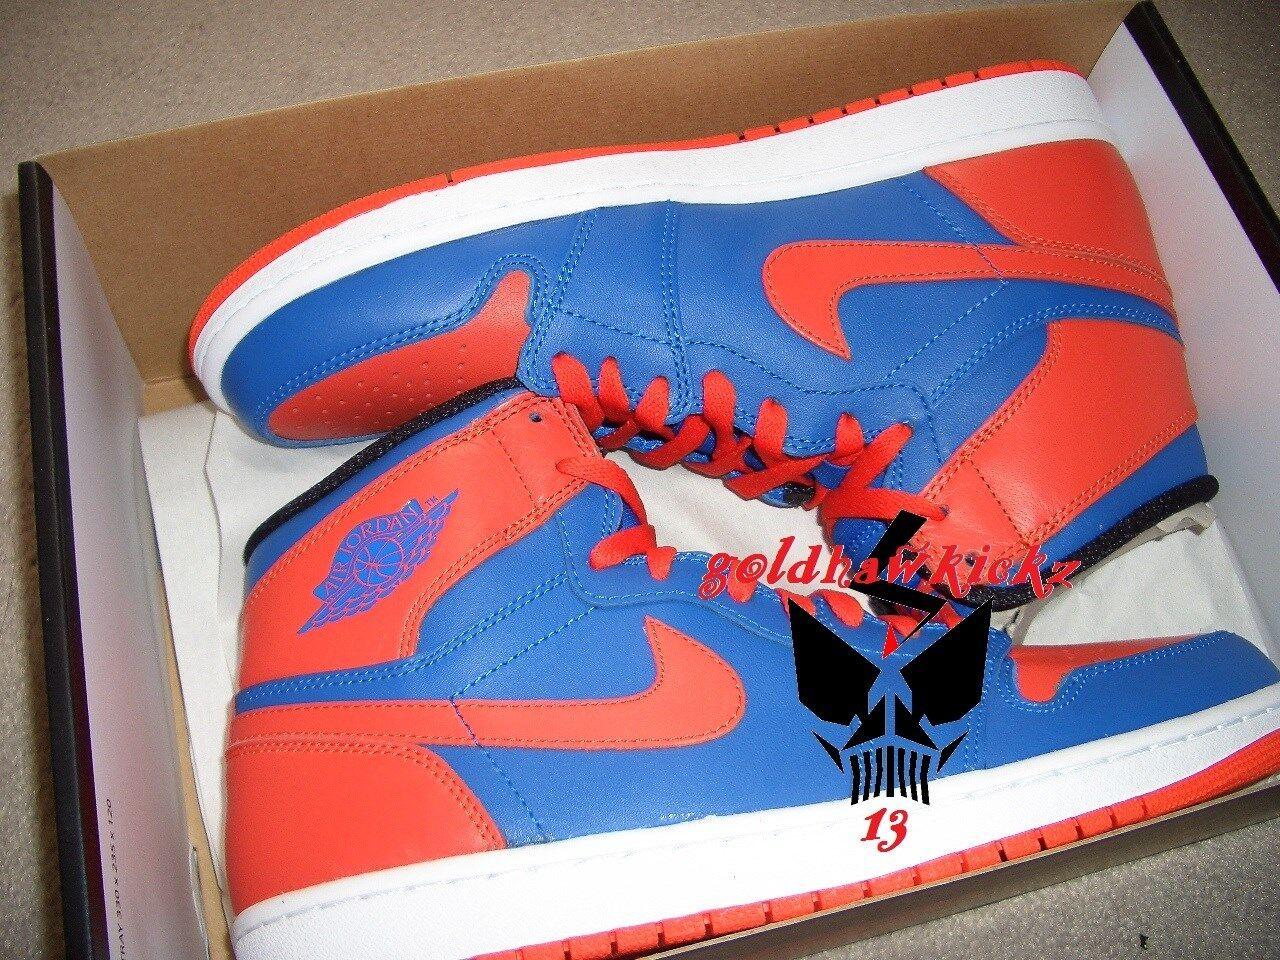 Nike Air Jordan 1 i one Retro High OG bluee orange NYC Knicks new york melo